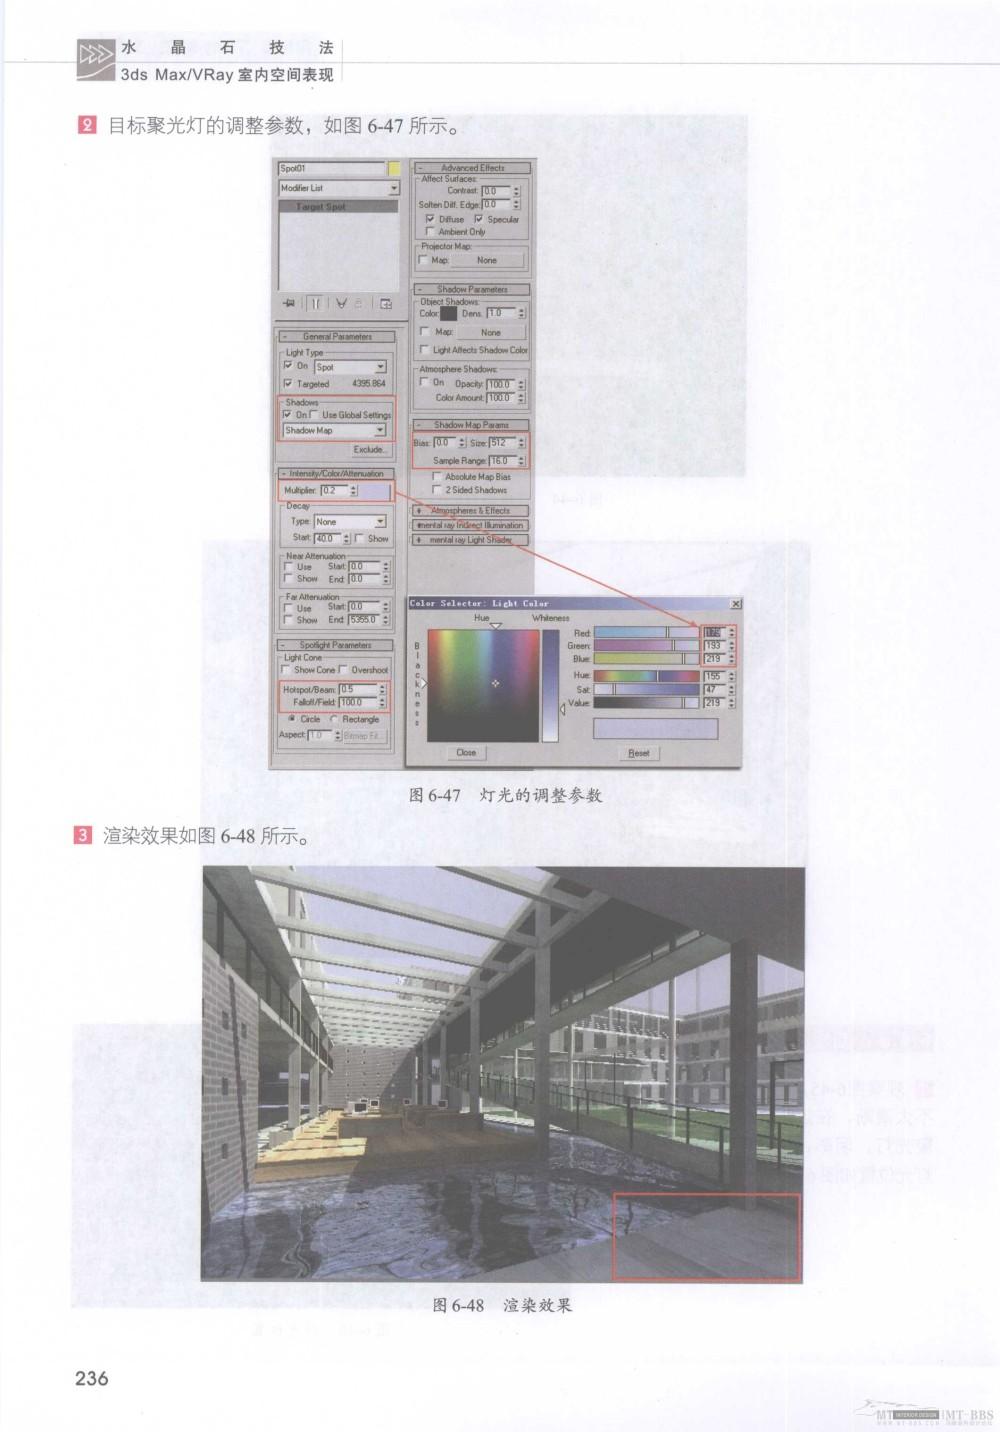 水晶石技法-3ds_Max&VRay室内空间表现_水晶石技法-3ds_Max&VRay室内空间表现_页面_242.jpg